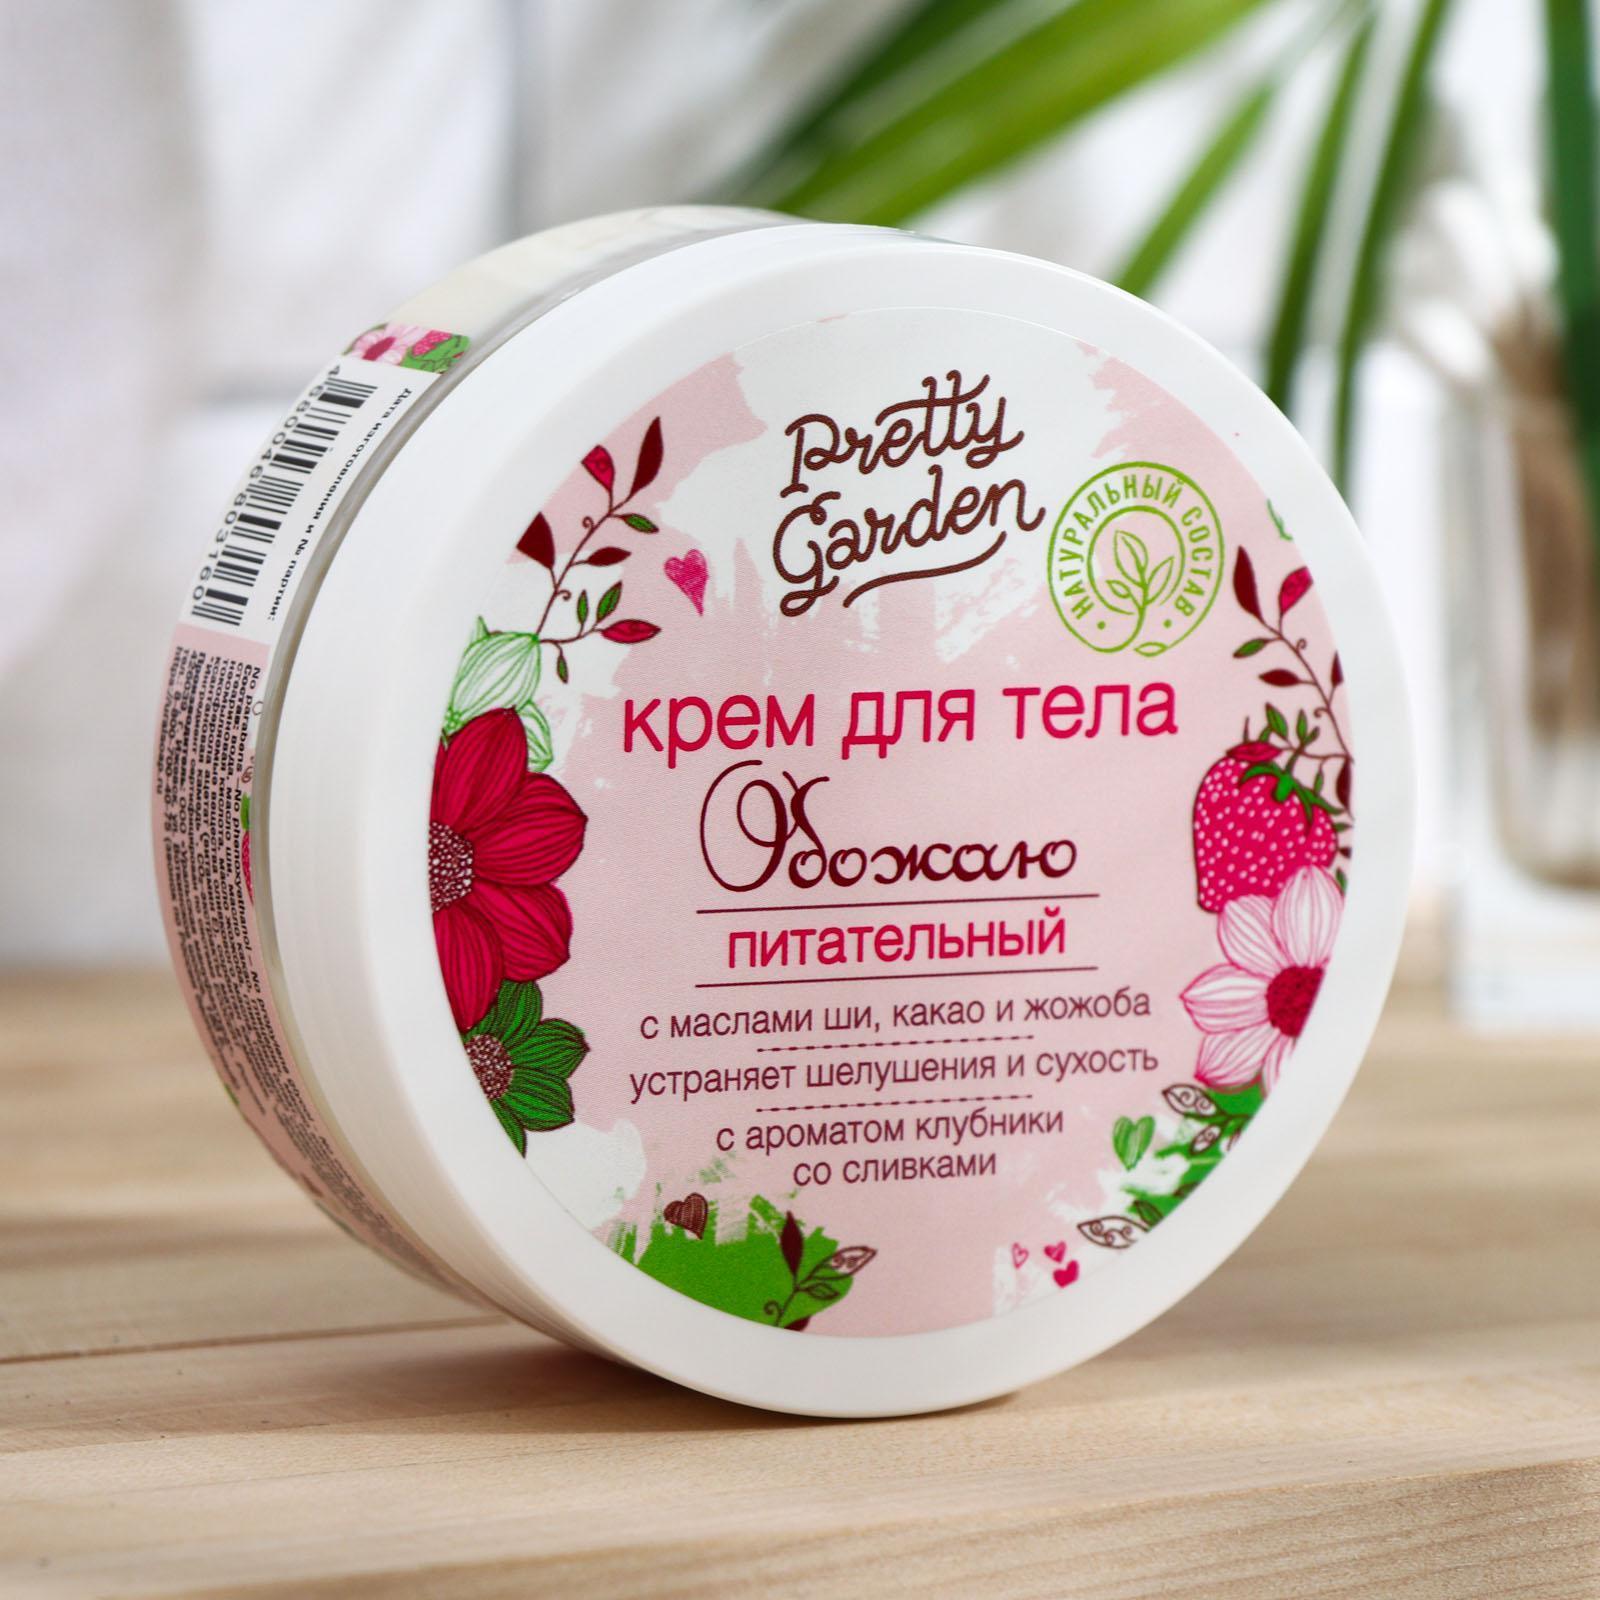 PRETTY GARDEN Body Cream Крем для тела